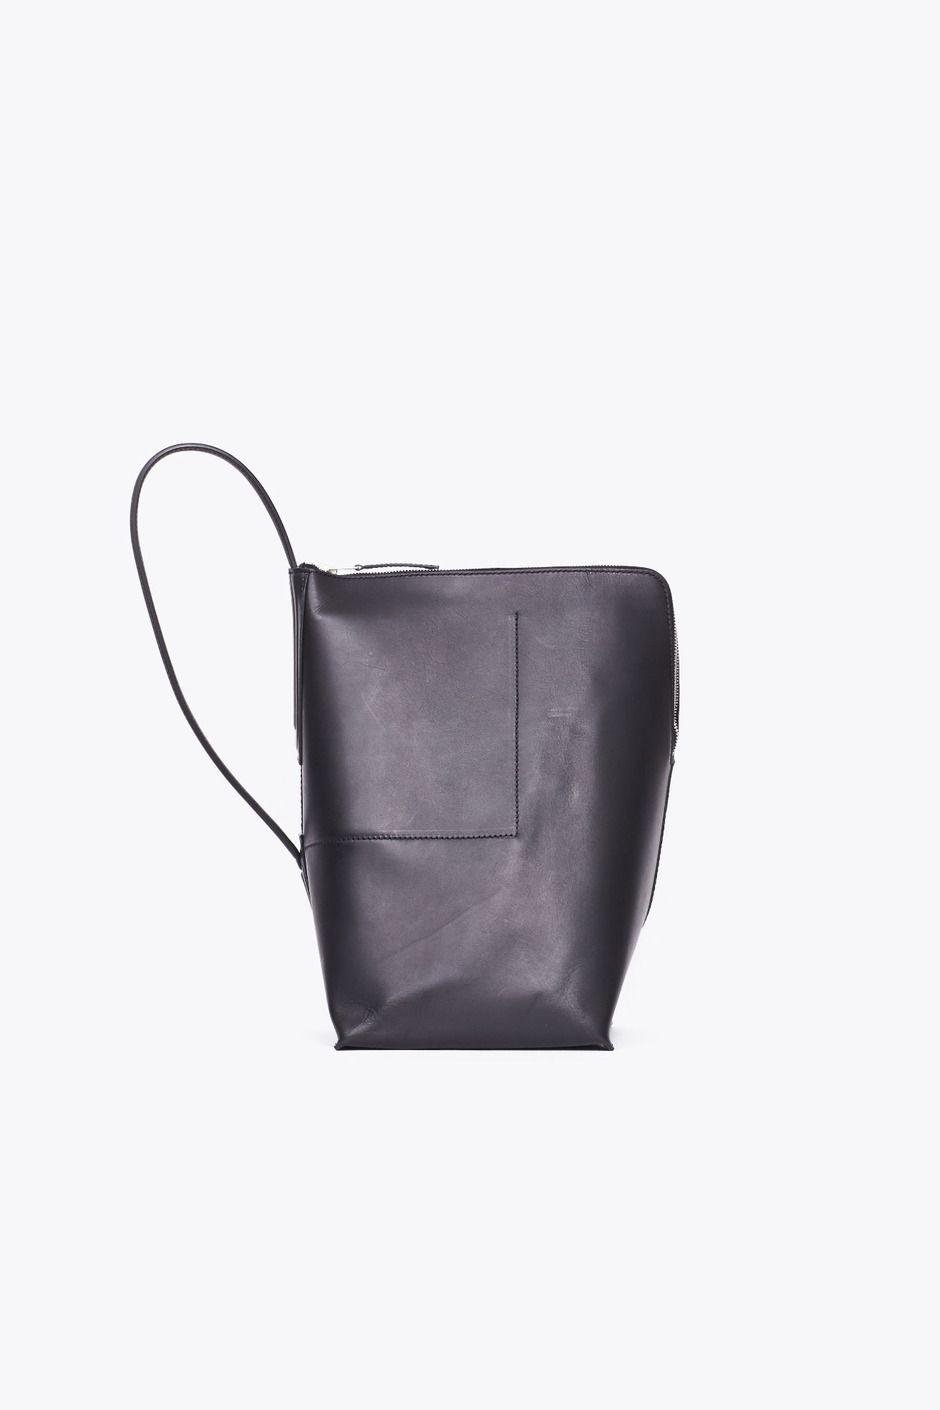 c142e01f4a MINIMAL + CLASSIC  Rick Owens Bucket Bag (Black)